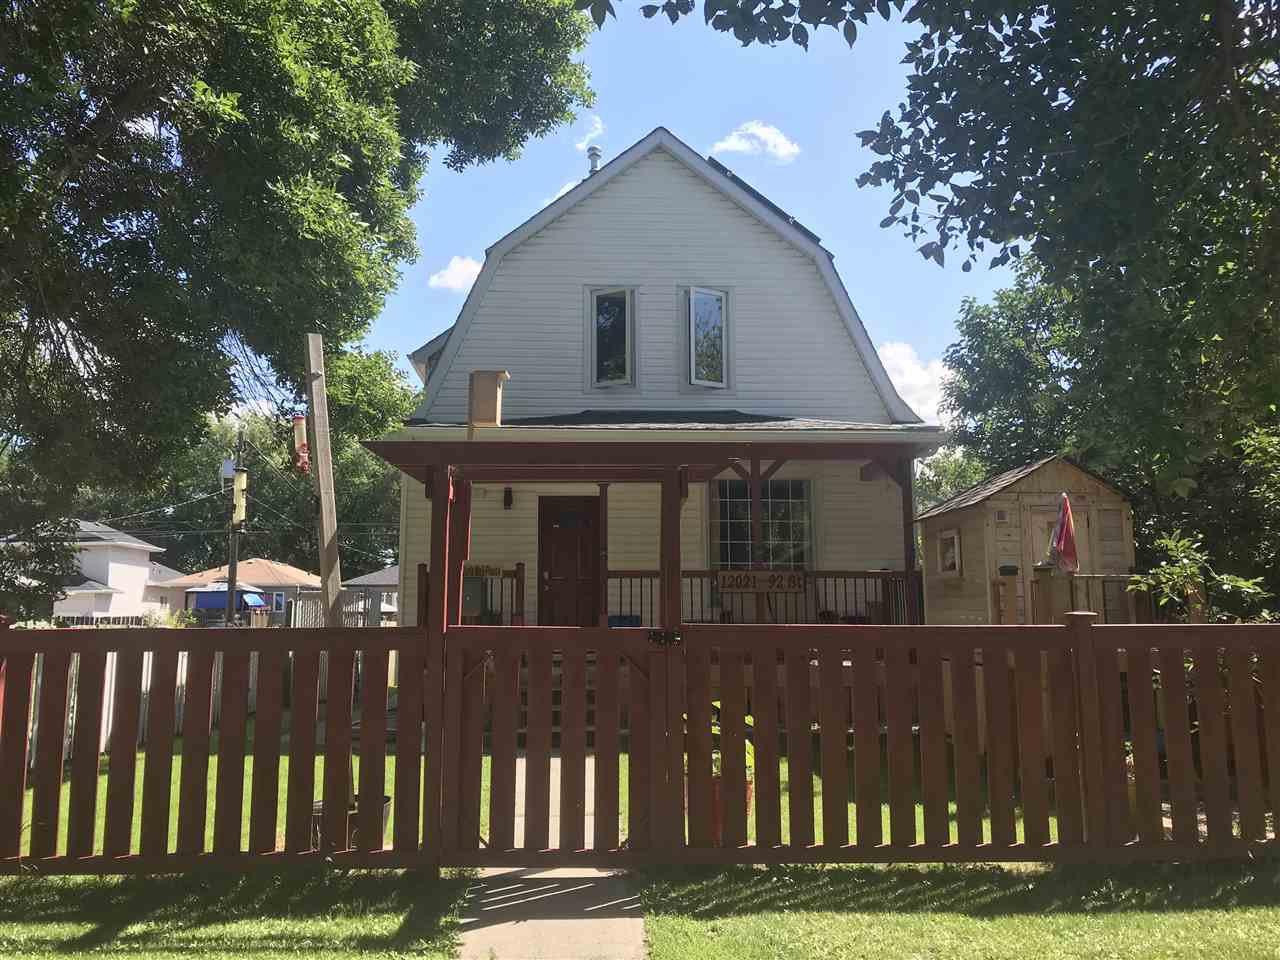 Main Photo: 12021 92 Street in Edmonton: Zone 05 House for sale : MLS®# E4206671